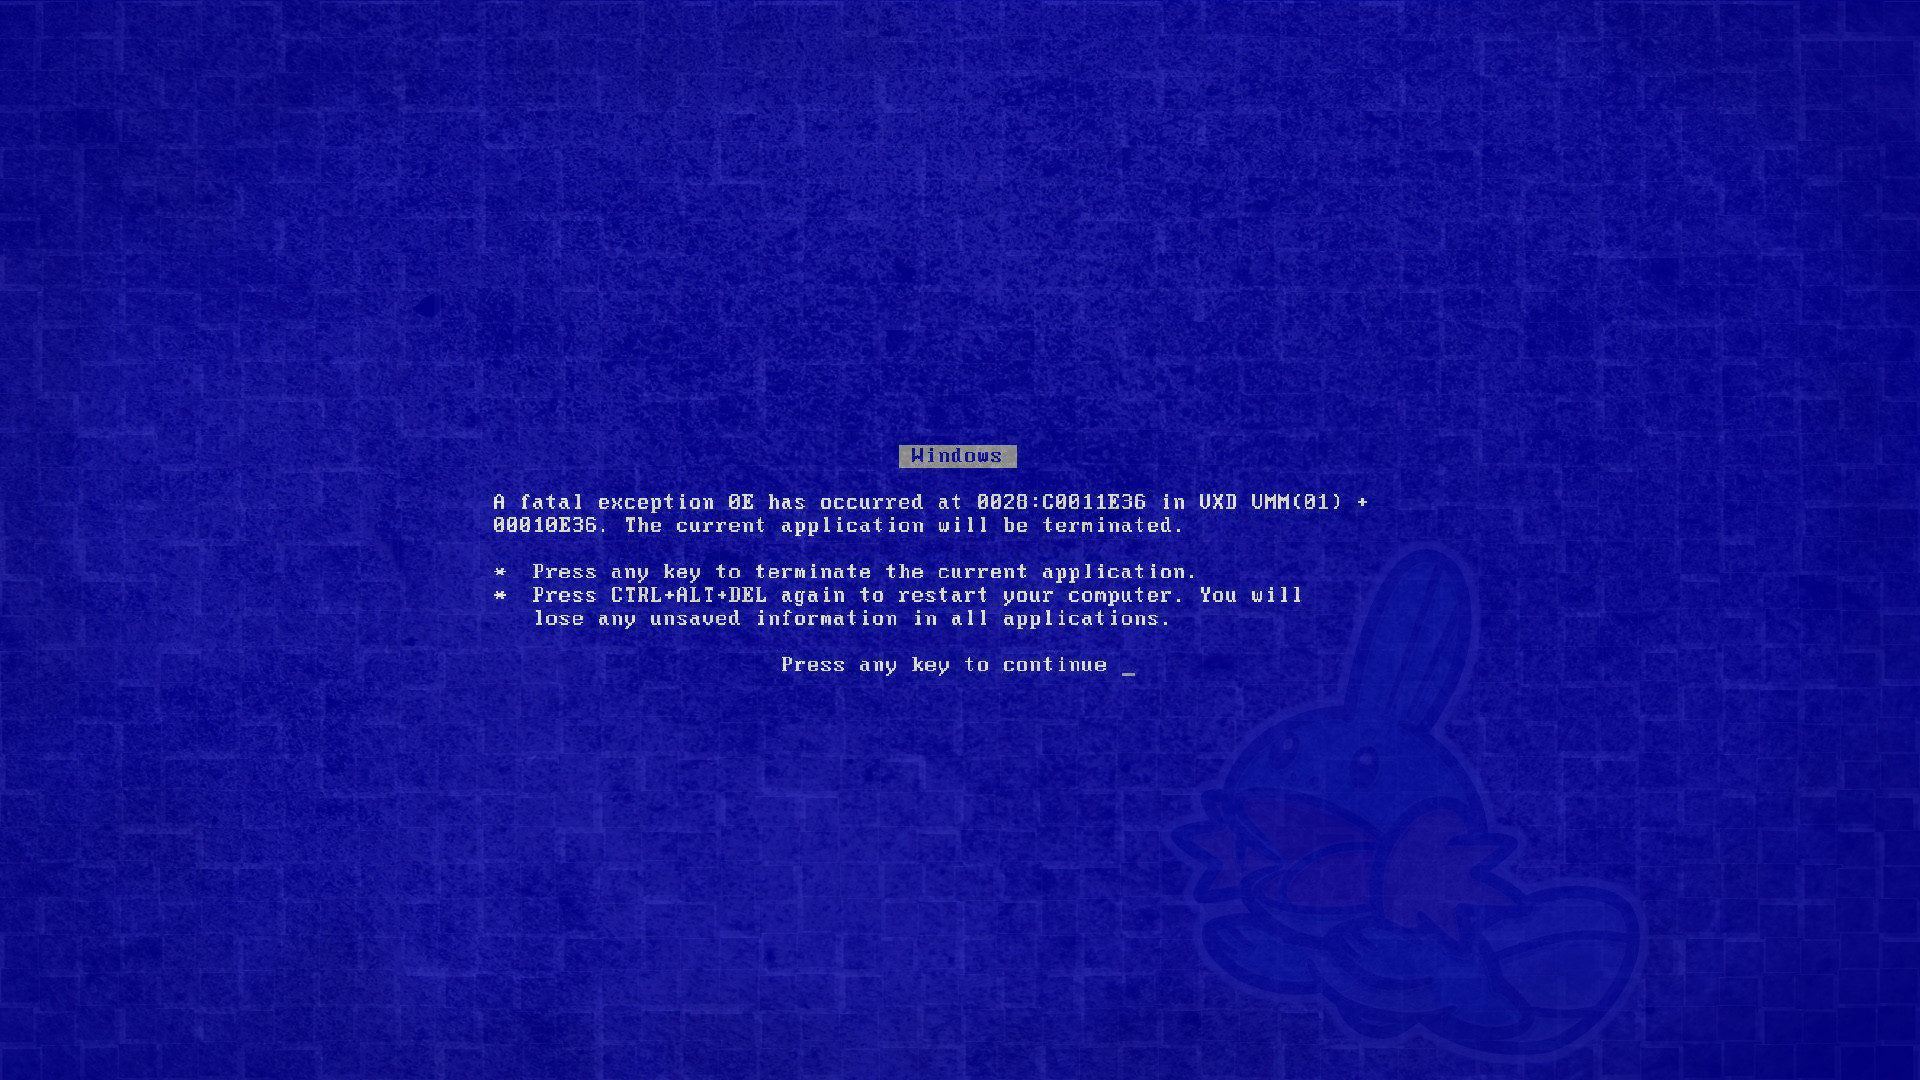 Blue Screen Wallpaper Death